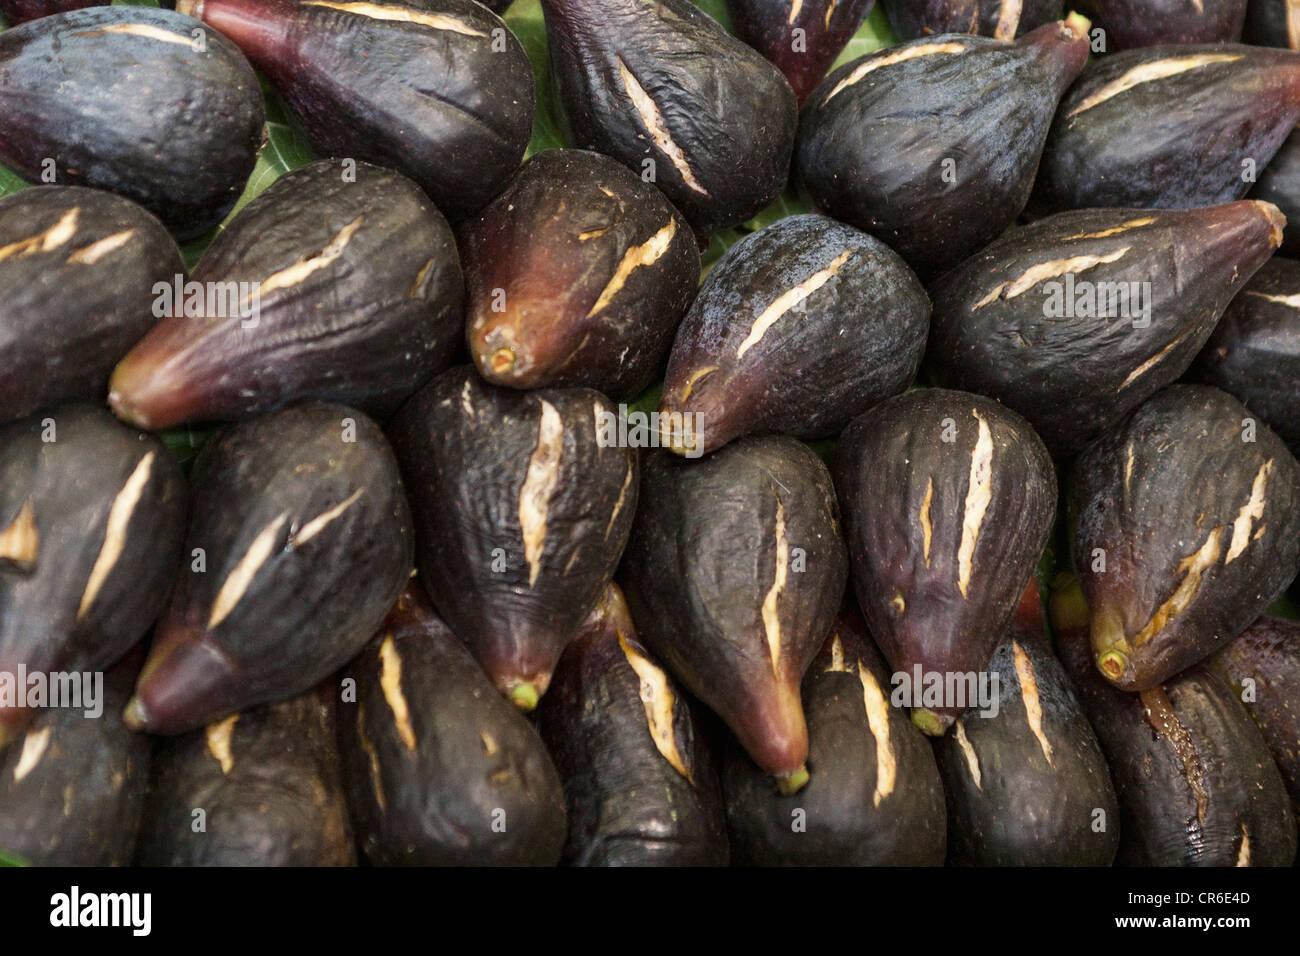 Spain, Malaga, Full frame of figs - Stock Image